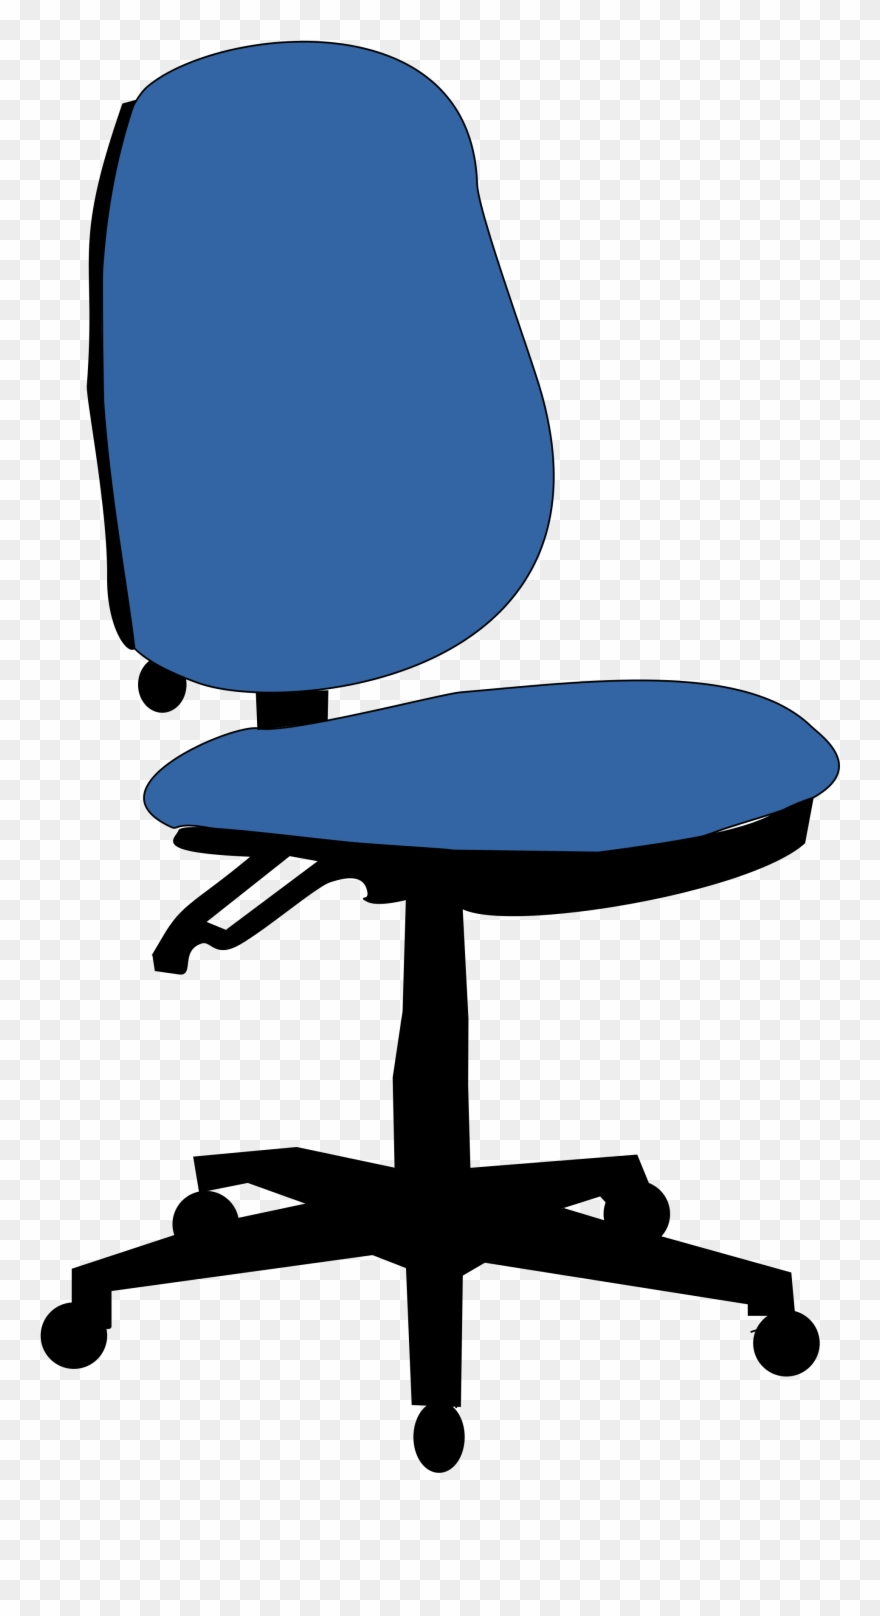 Chair clipart background banner library Teacher Chair Clip Art Free Cliparts Rh P2p2p2 Com - Blue Chair ... banner library